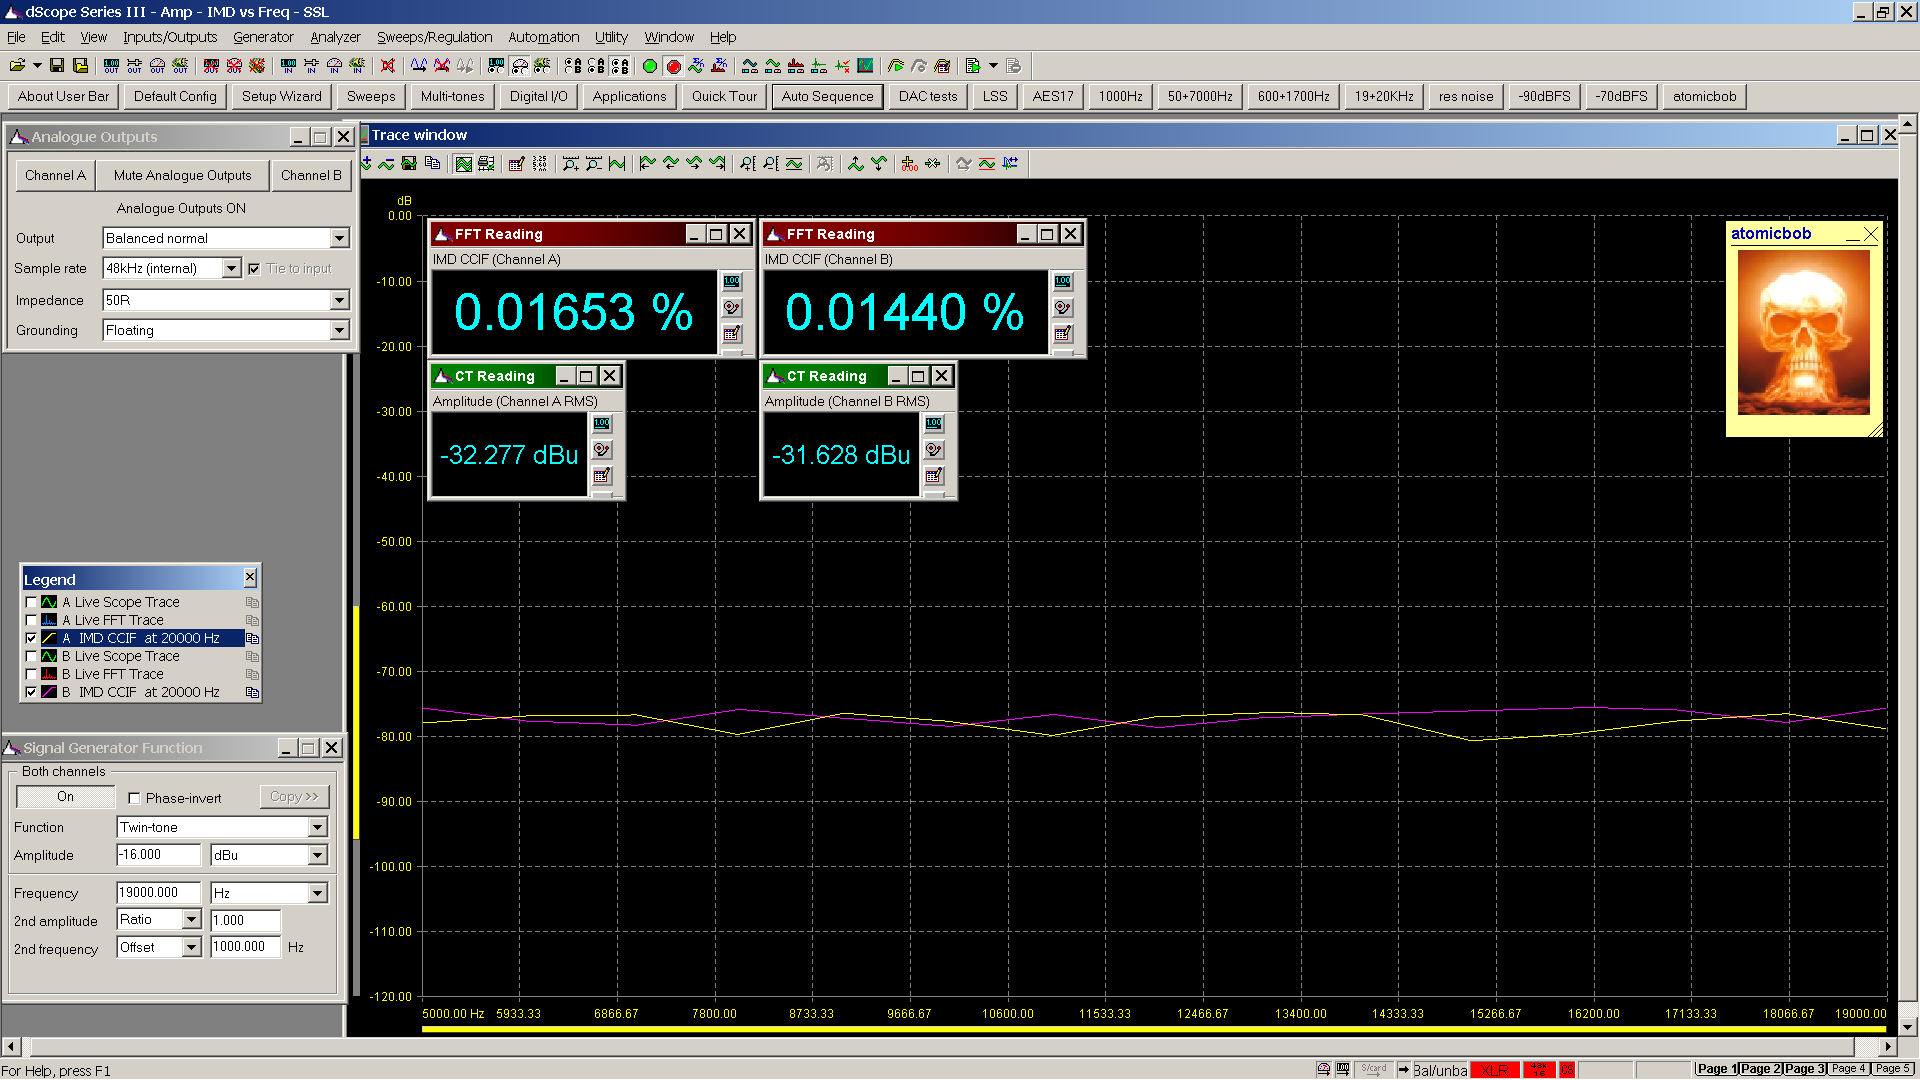 20191007 SW51+ 6Z51P 19+20KHz IMD sweep 20KHz to 5KHz 300R HiZ -20dB gain.png